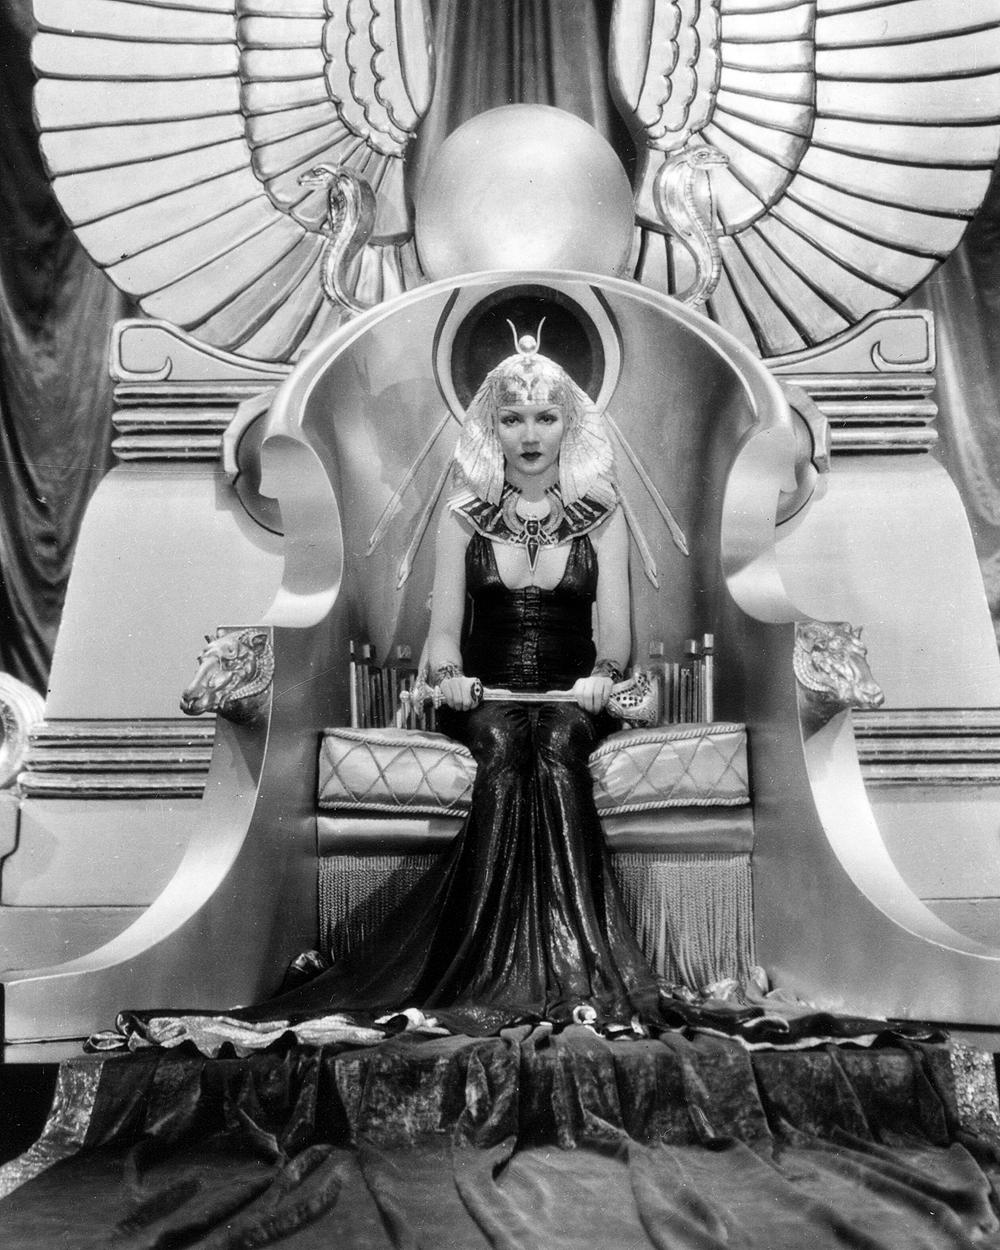 7-Costumes-Wild-Cleopatra-34-1.jpg